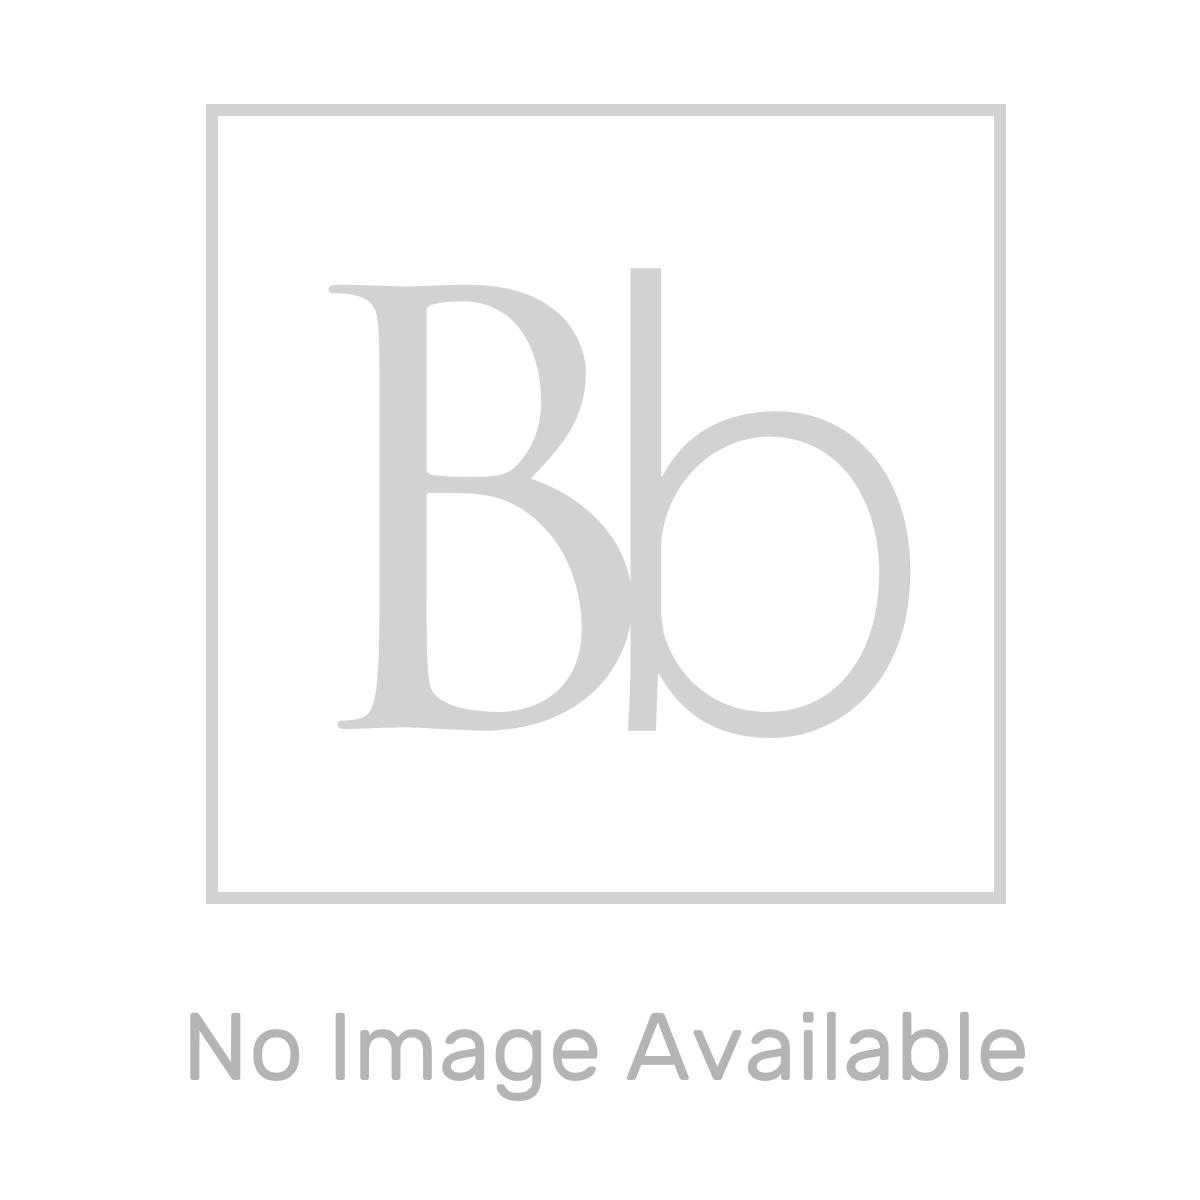 Sensio Ainsley Single Door LED Cabinet Mirror 700 x 564 x 126 2